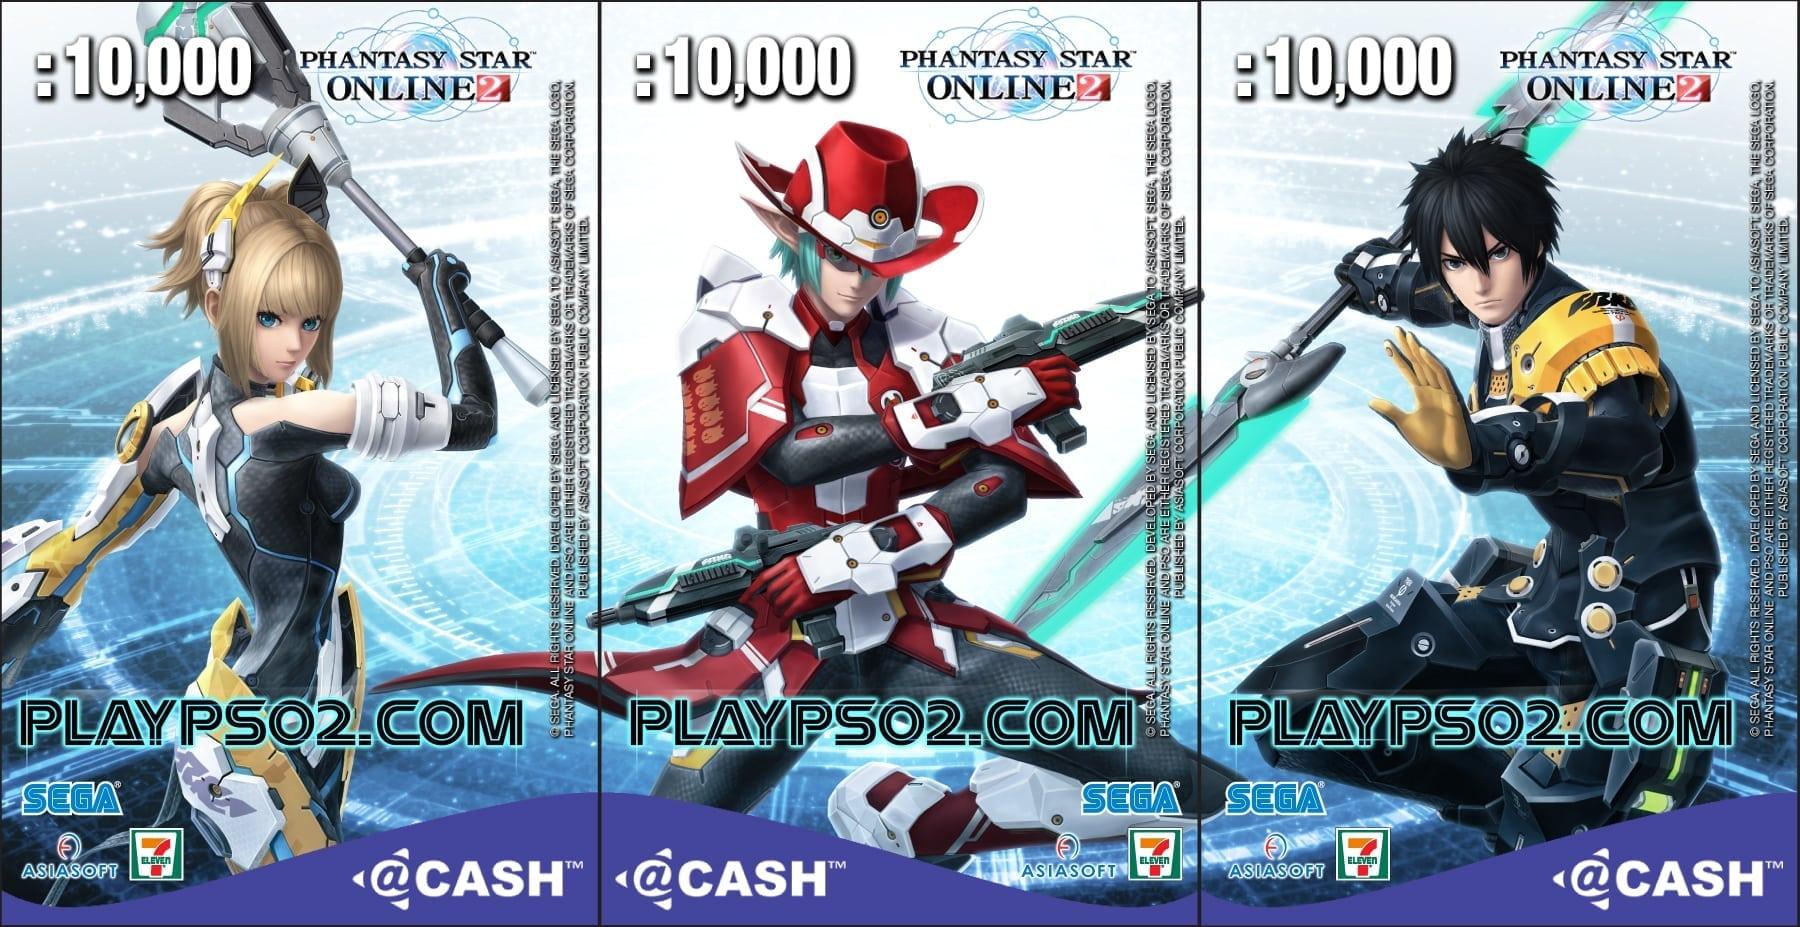 PSO2 SEA - Prepaid cards